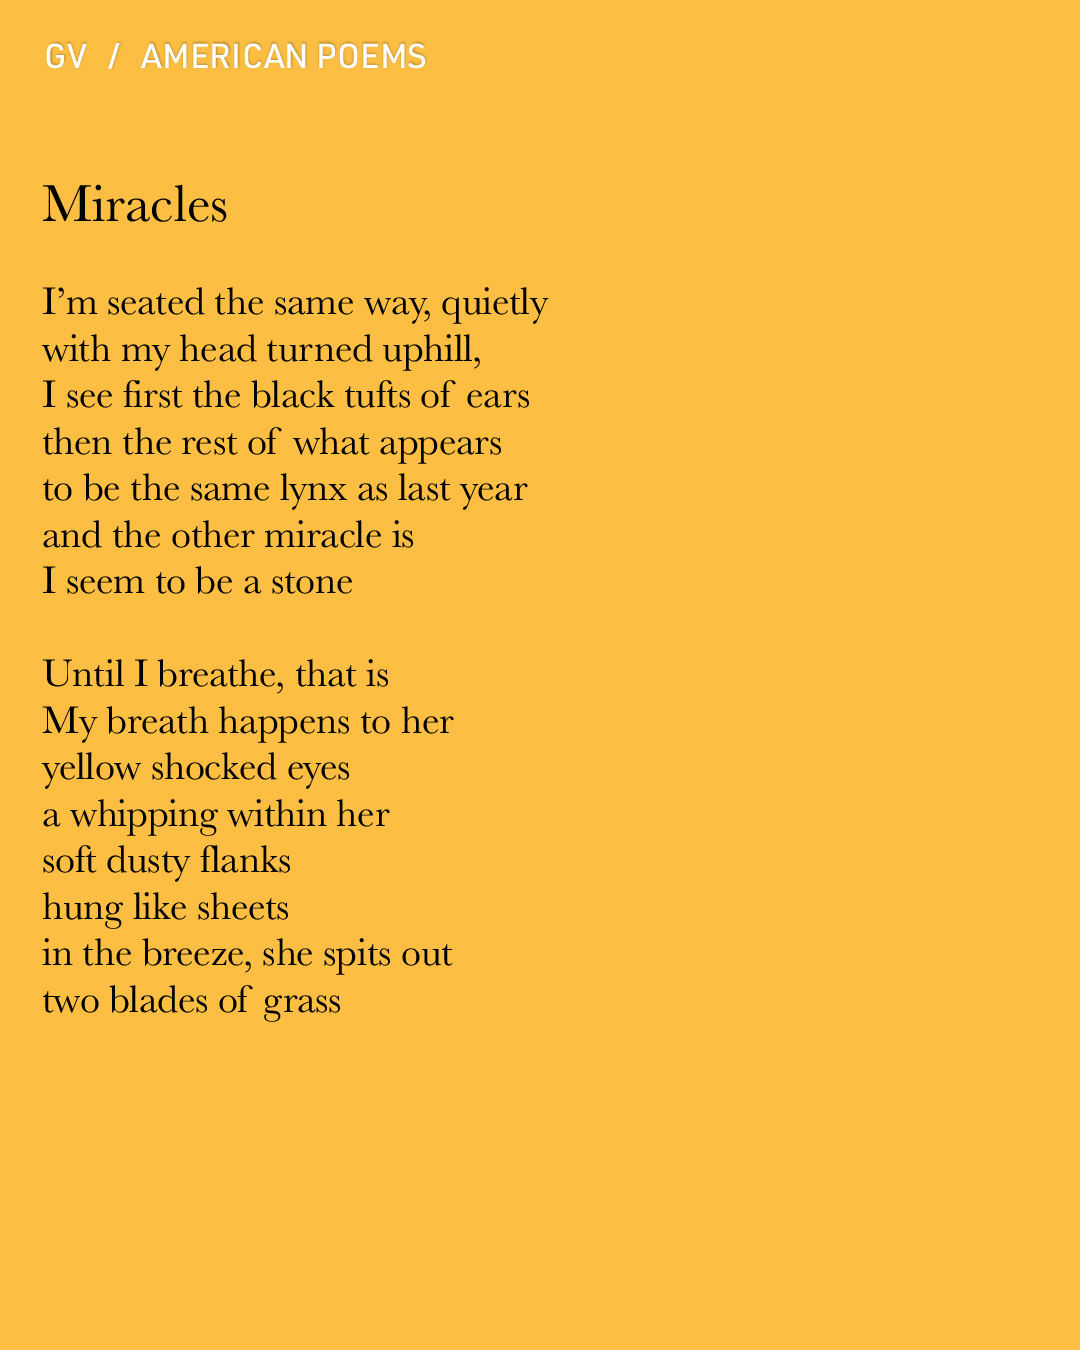 Gvion-PoemsA-Miracles.jpg